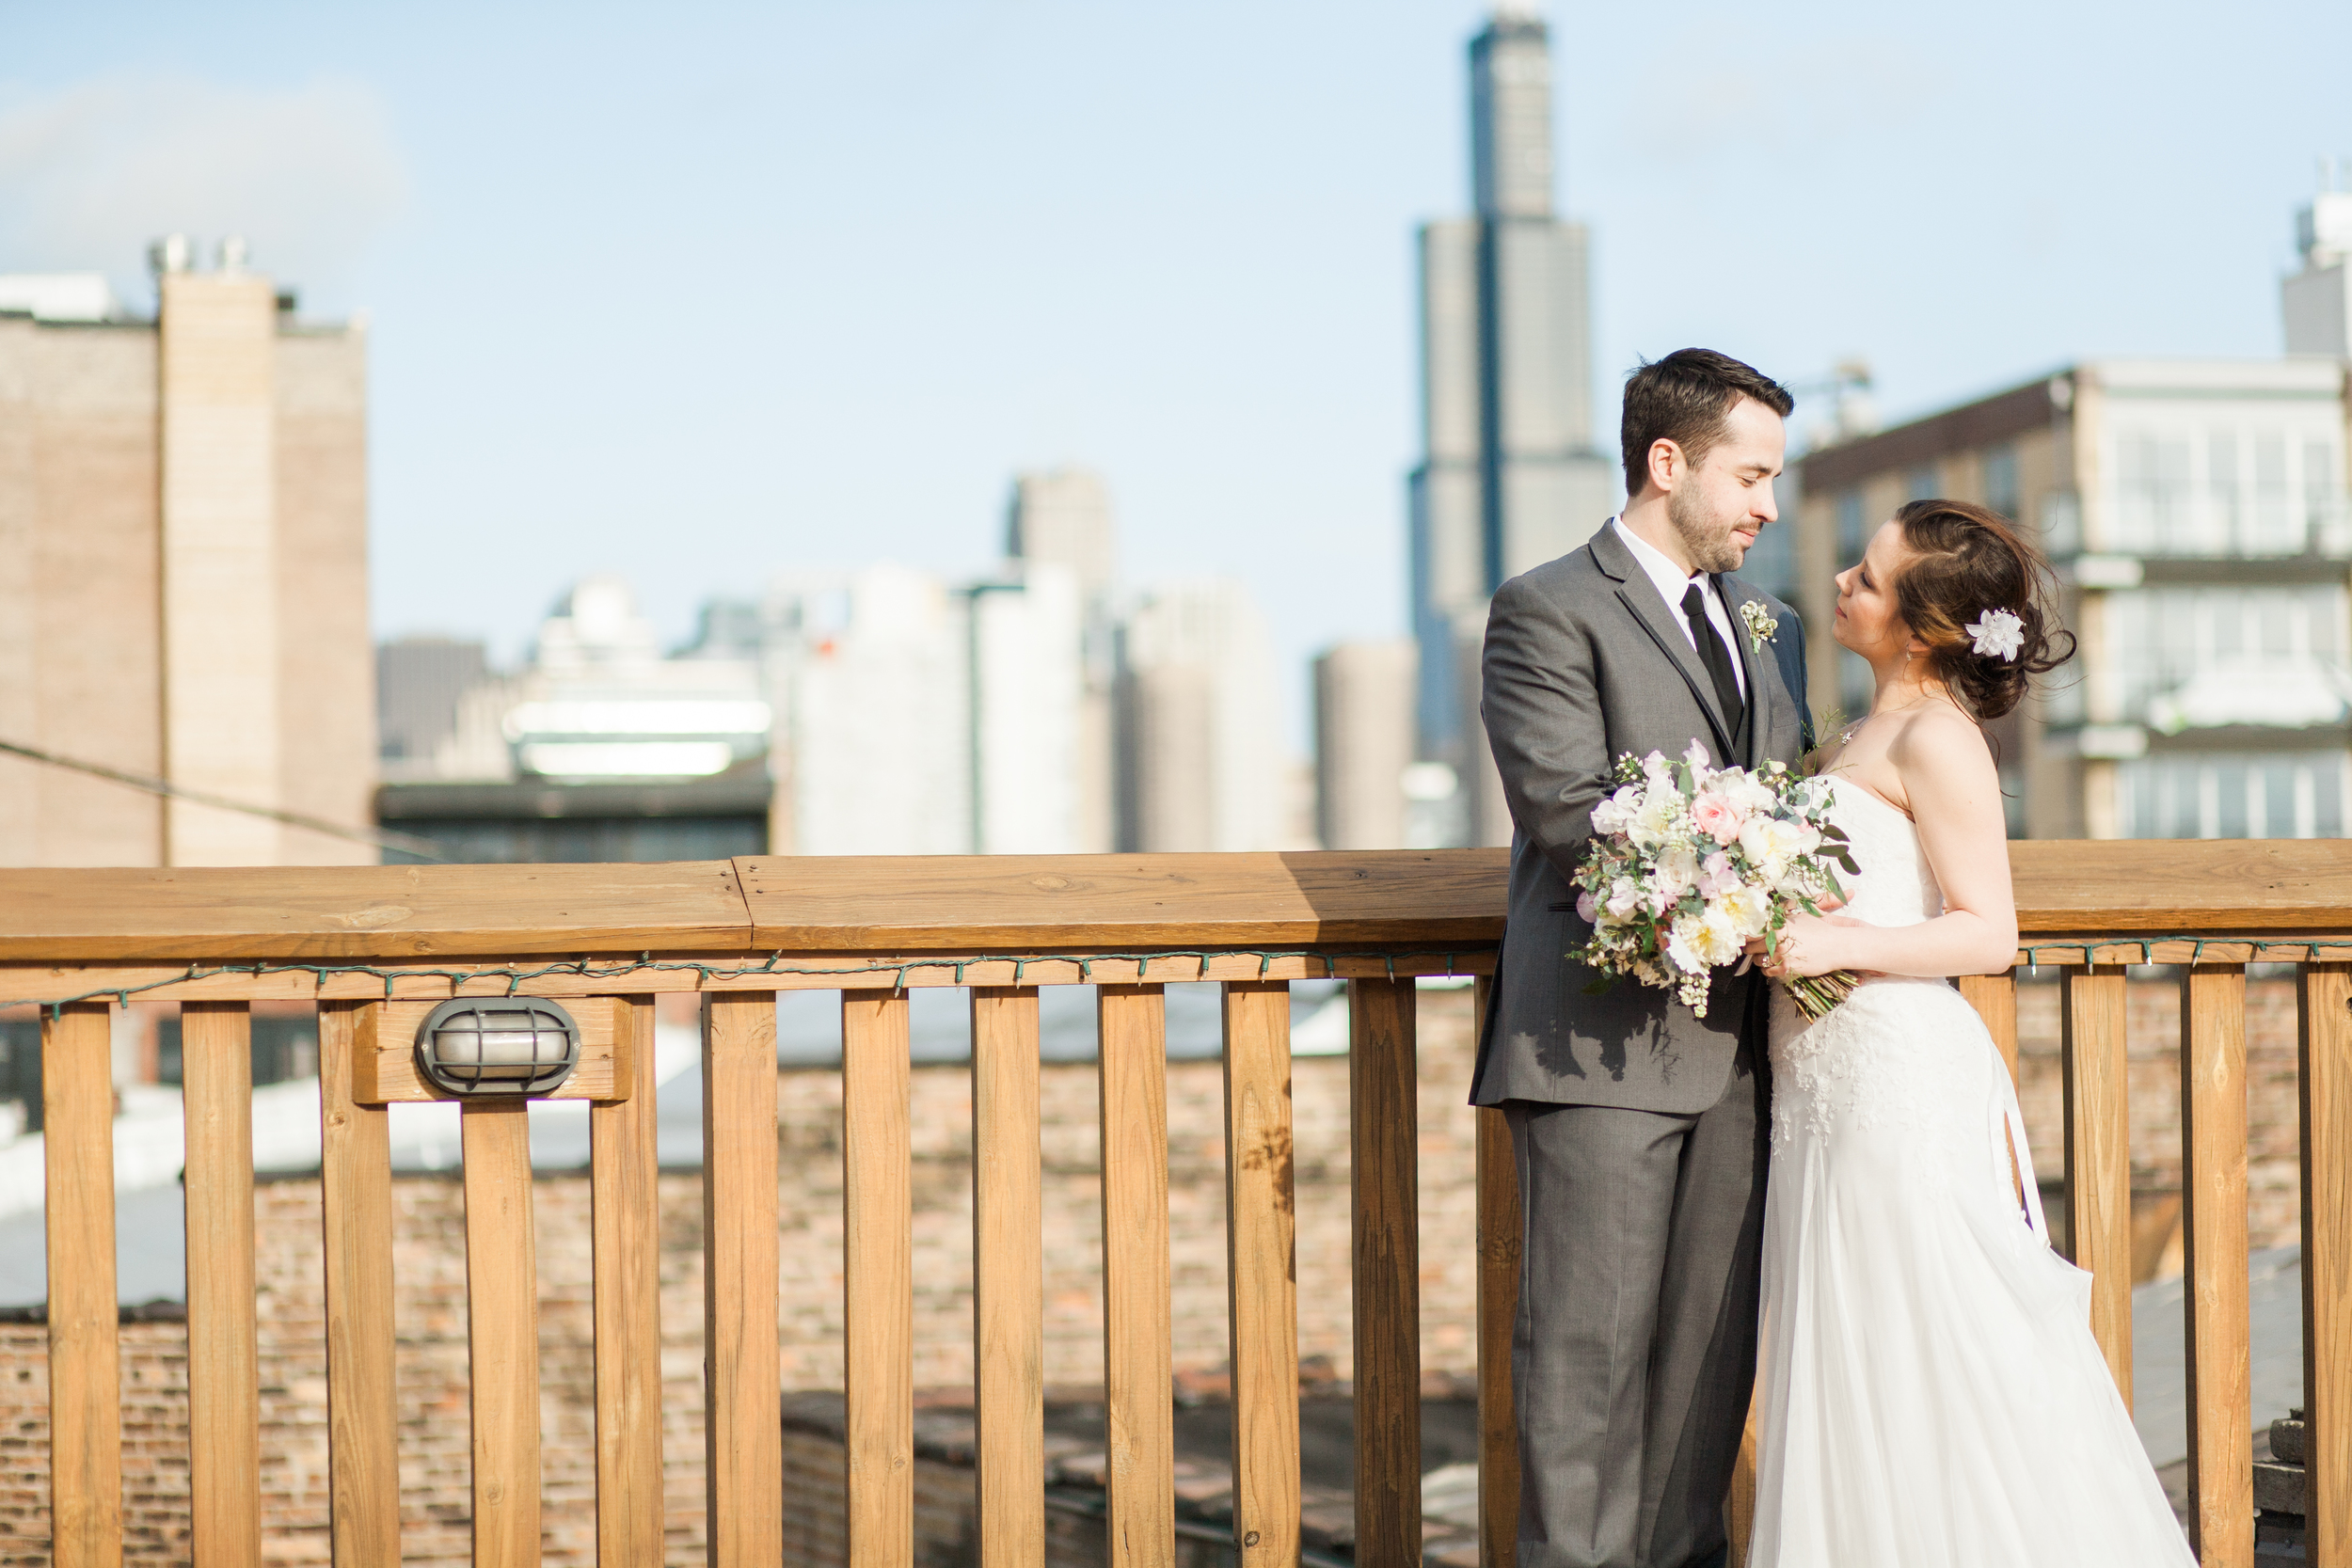 Liana and Michael Neff | Loft on the Lake | Chicago, Illinois | Michelle Mock Photography